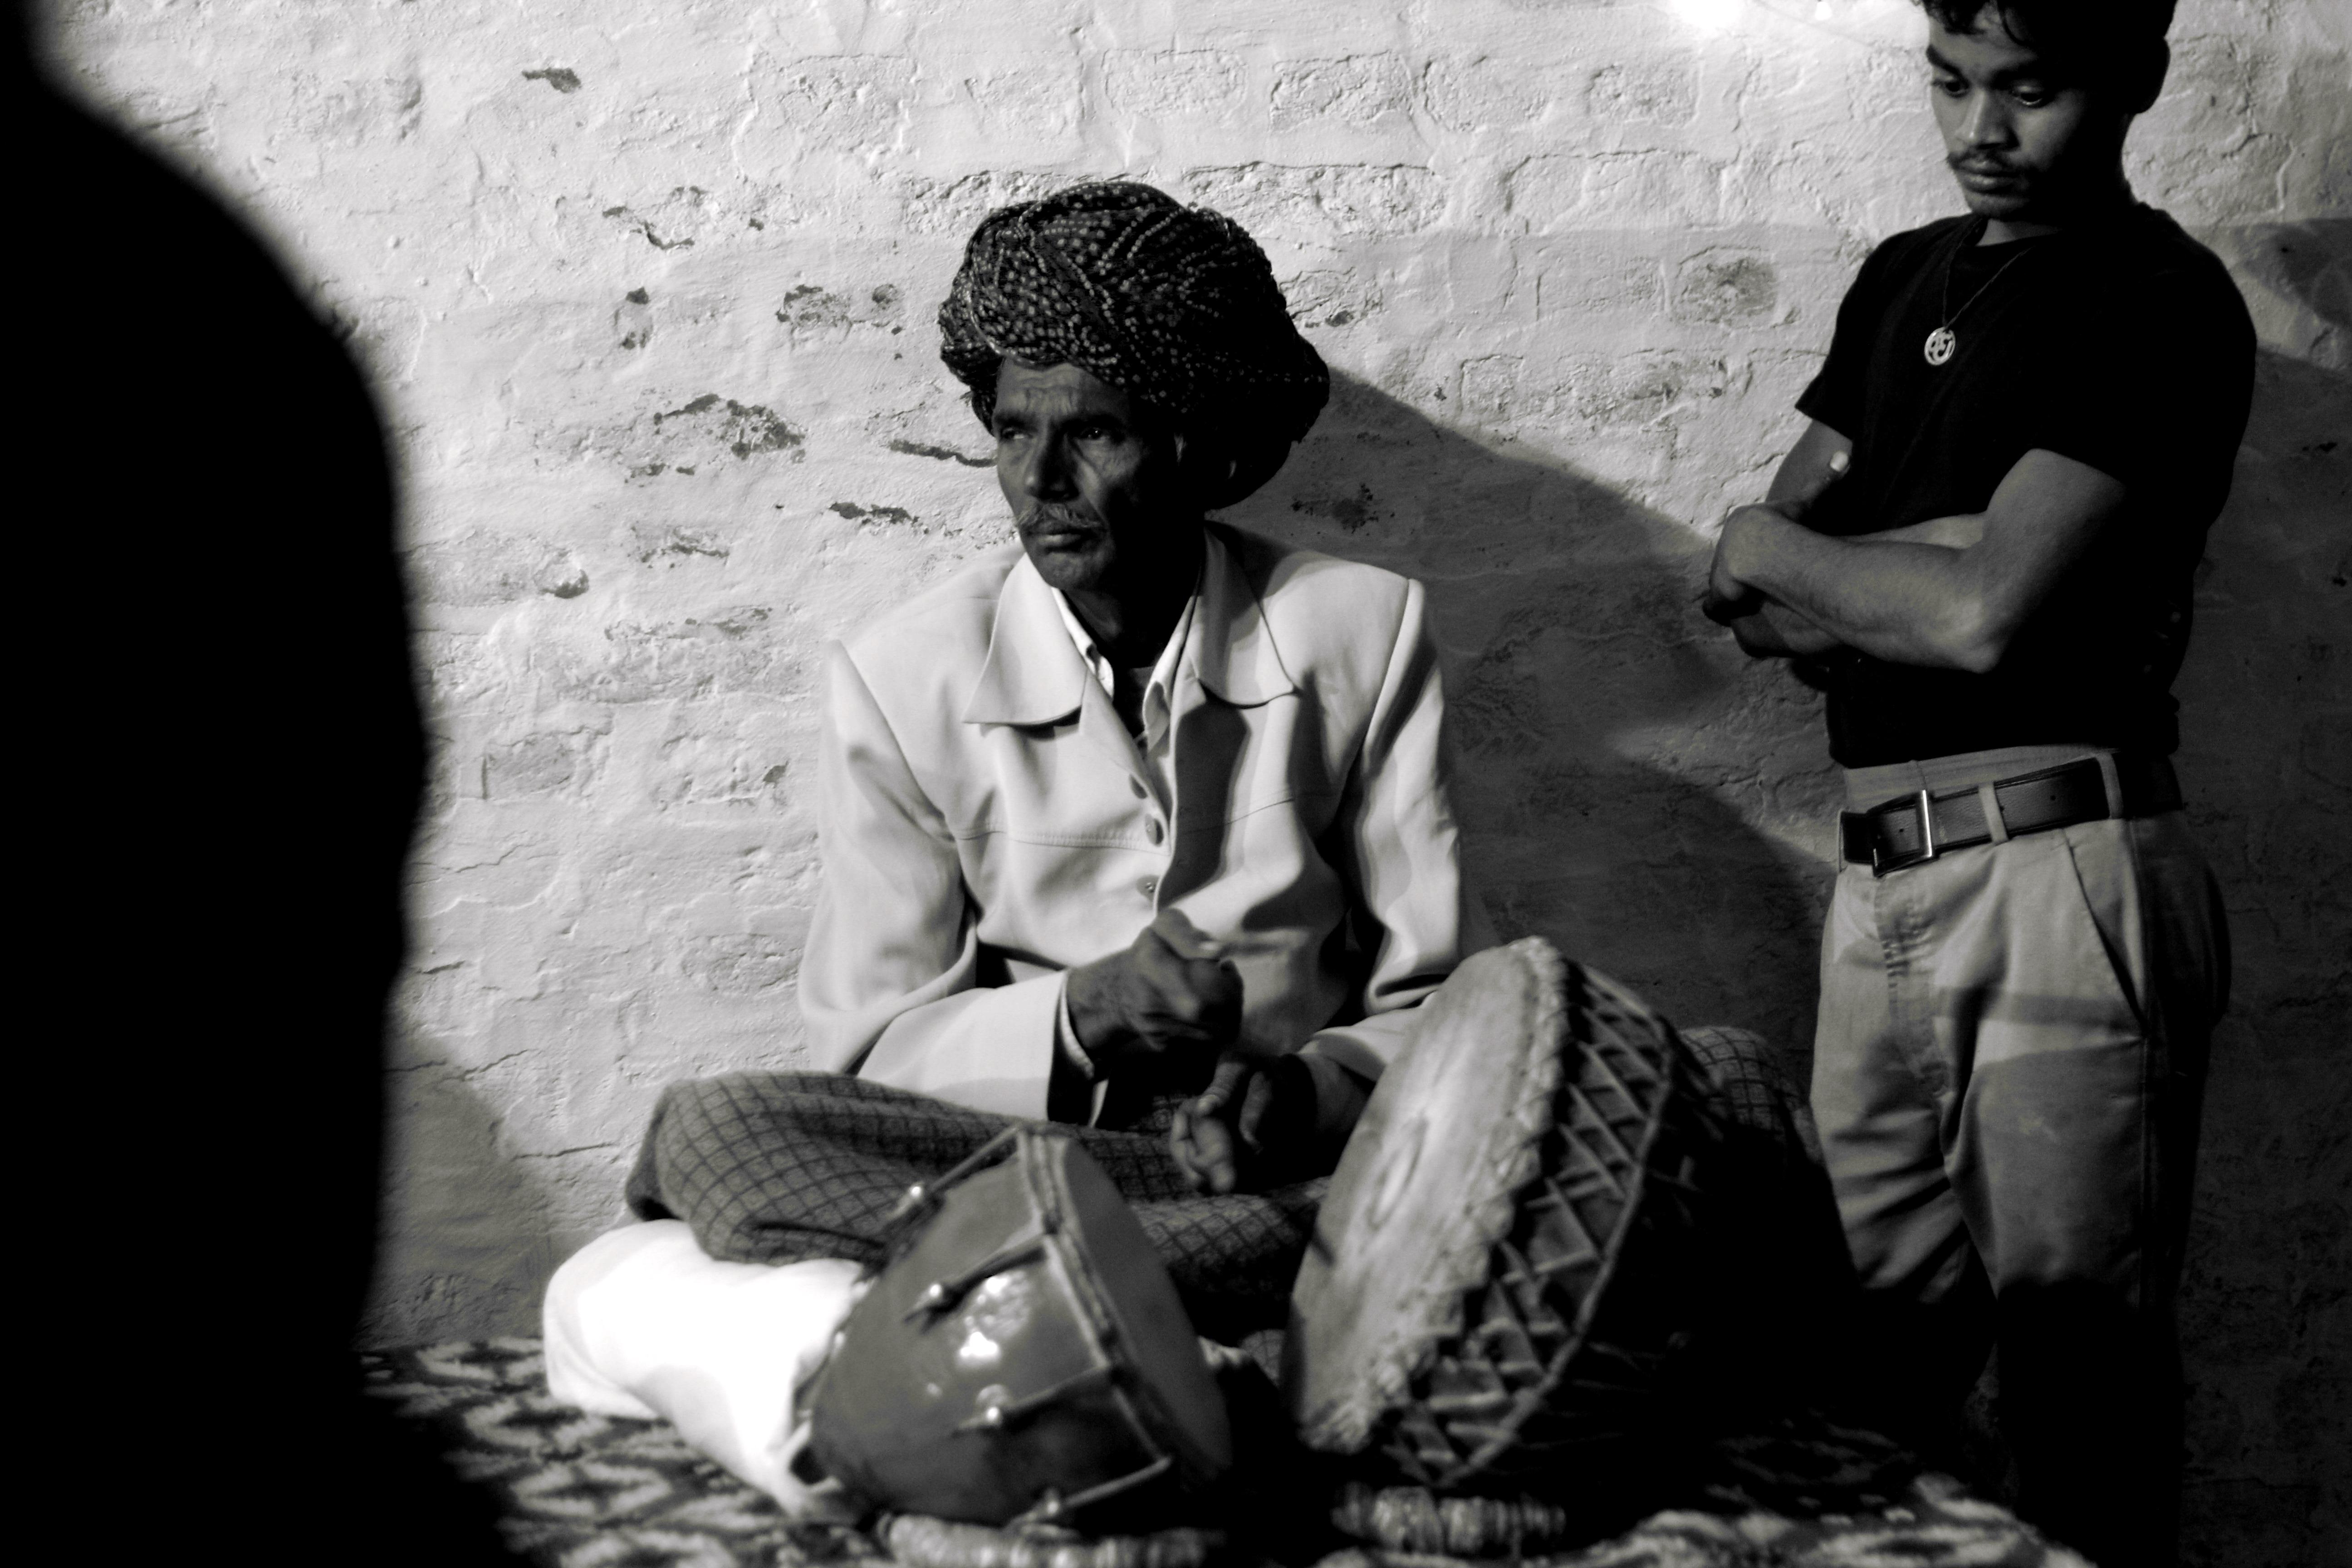 2011 Rajasthan, India.